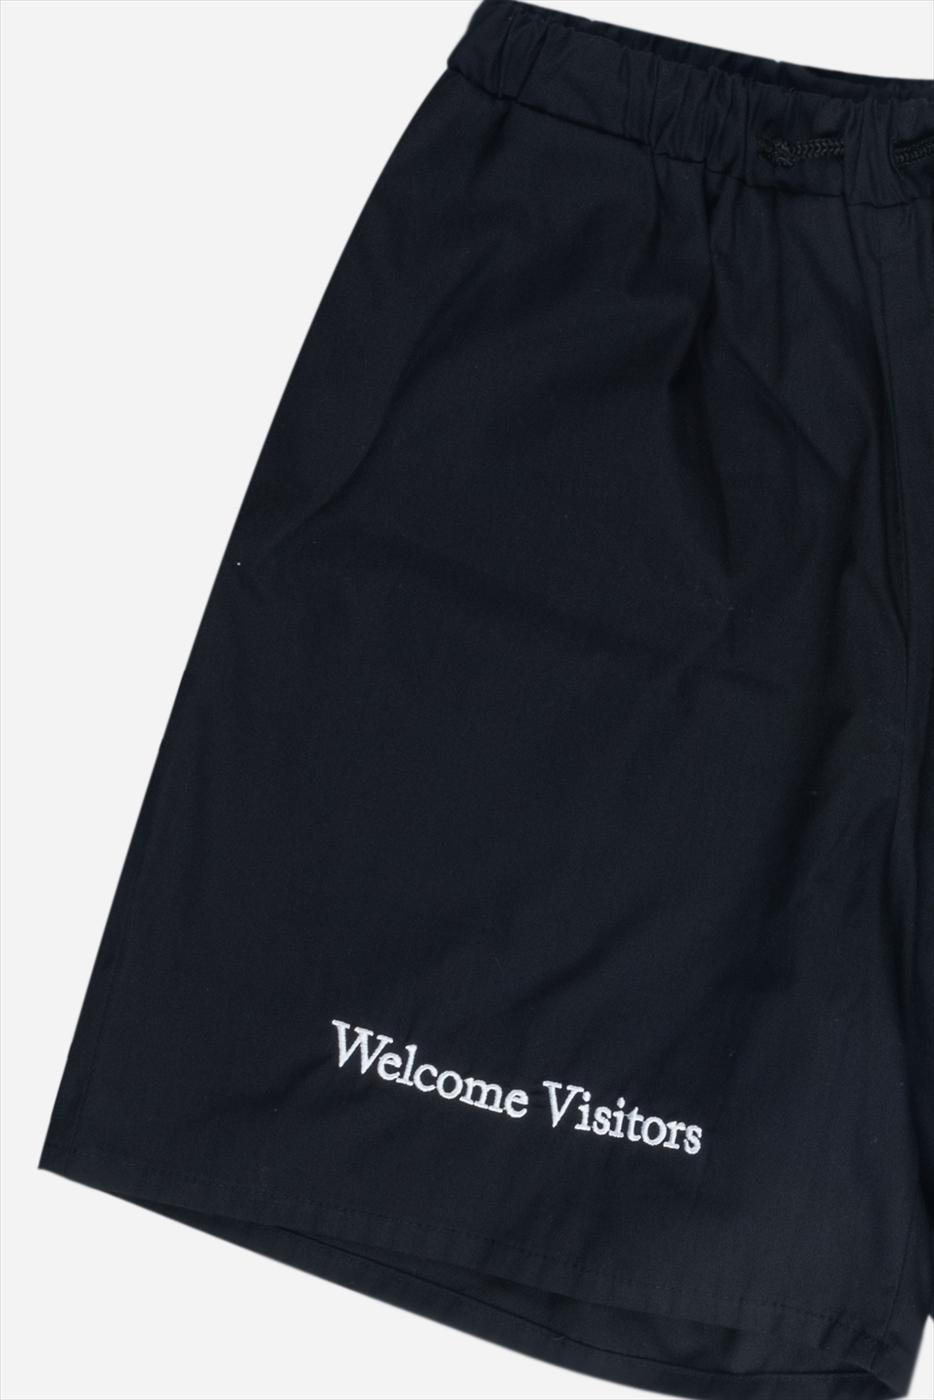 【PAS DE MER/パドゥメ】WELCOME VISITORS SHORTS  ショートパンツ / BLACK